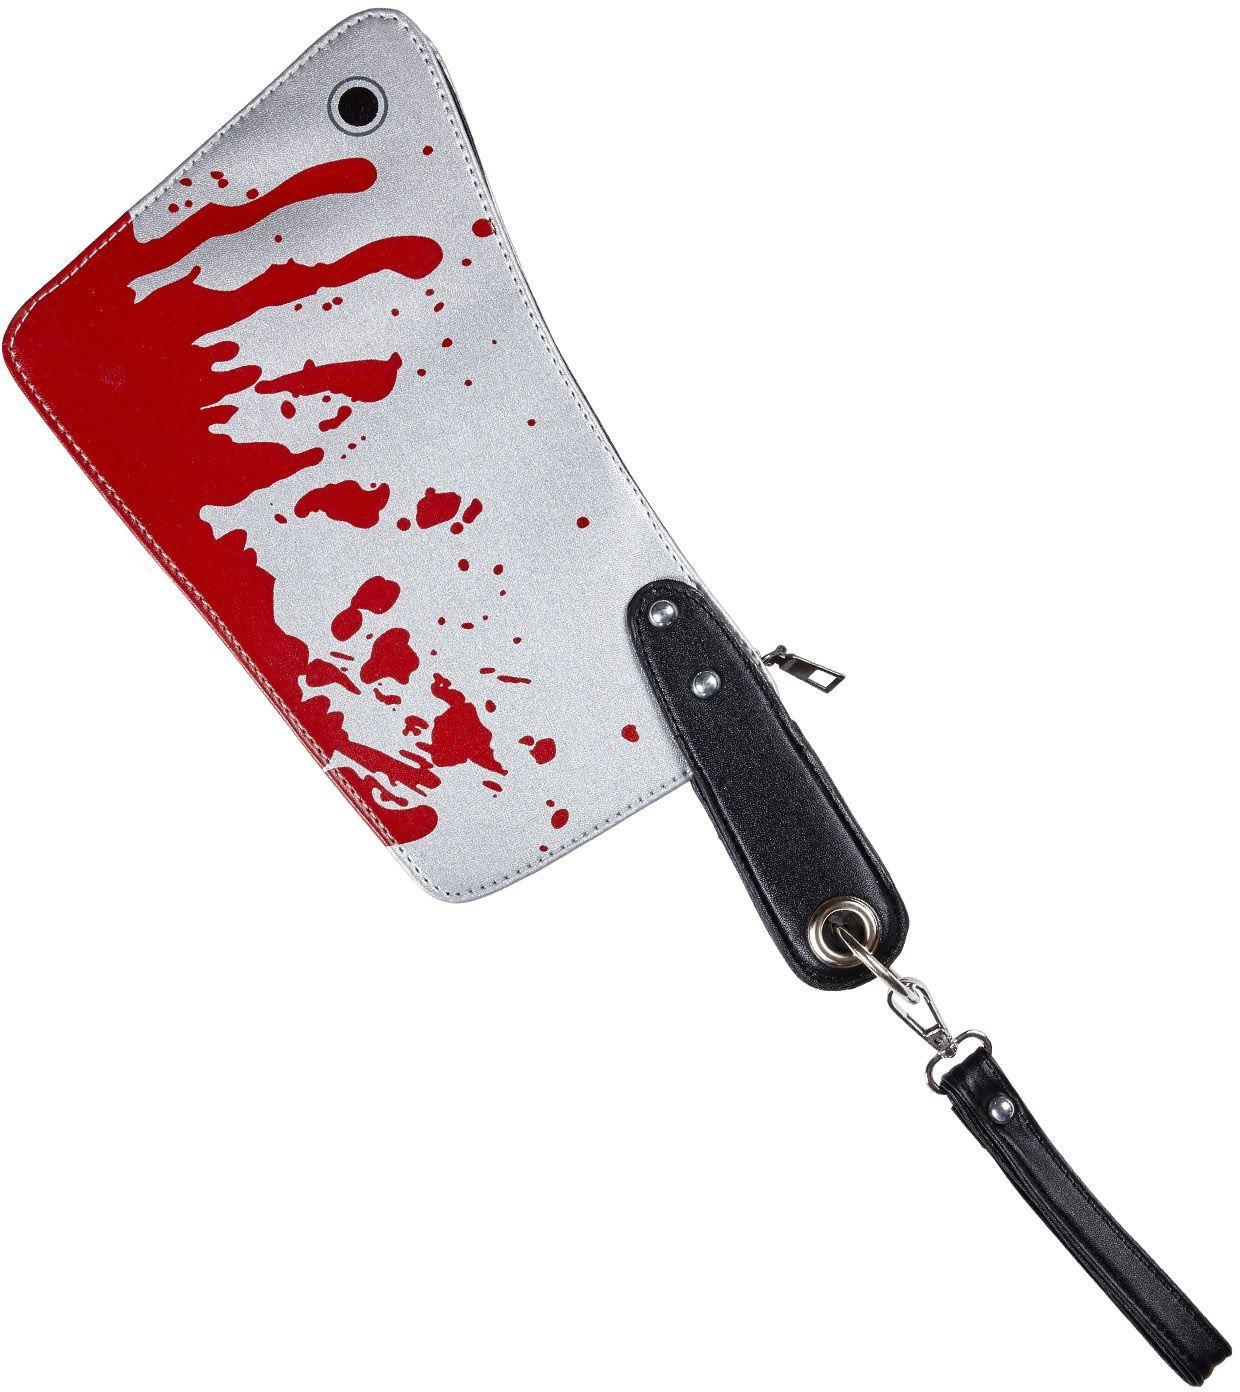 Bloederig mes slager portemonnee